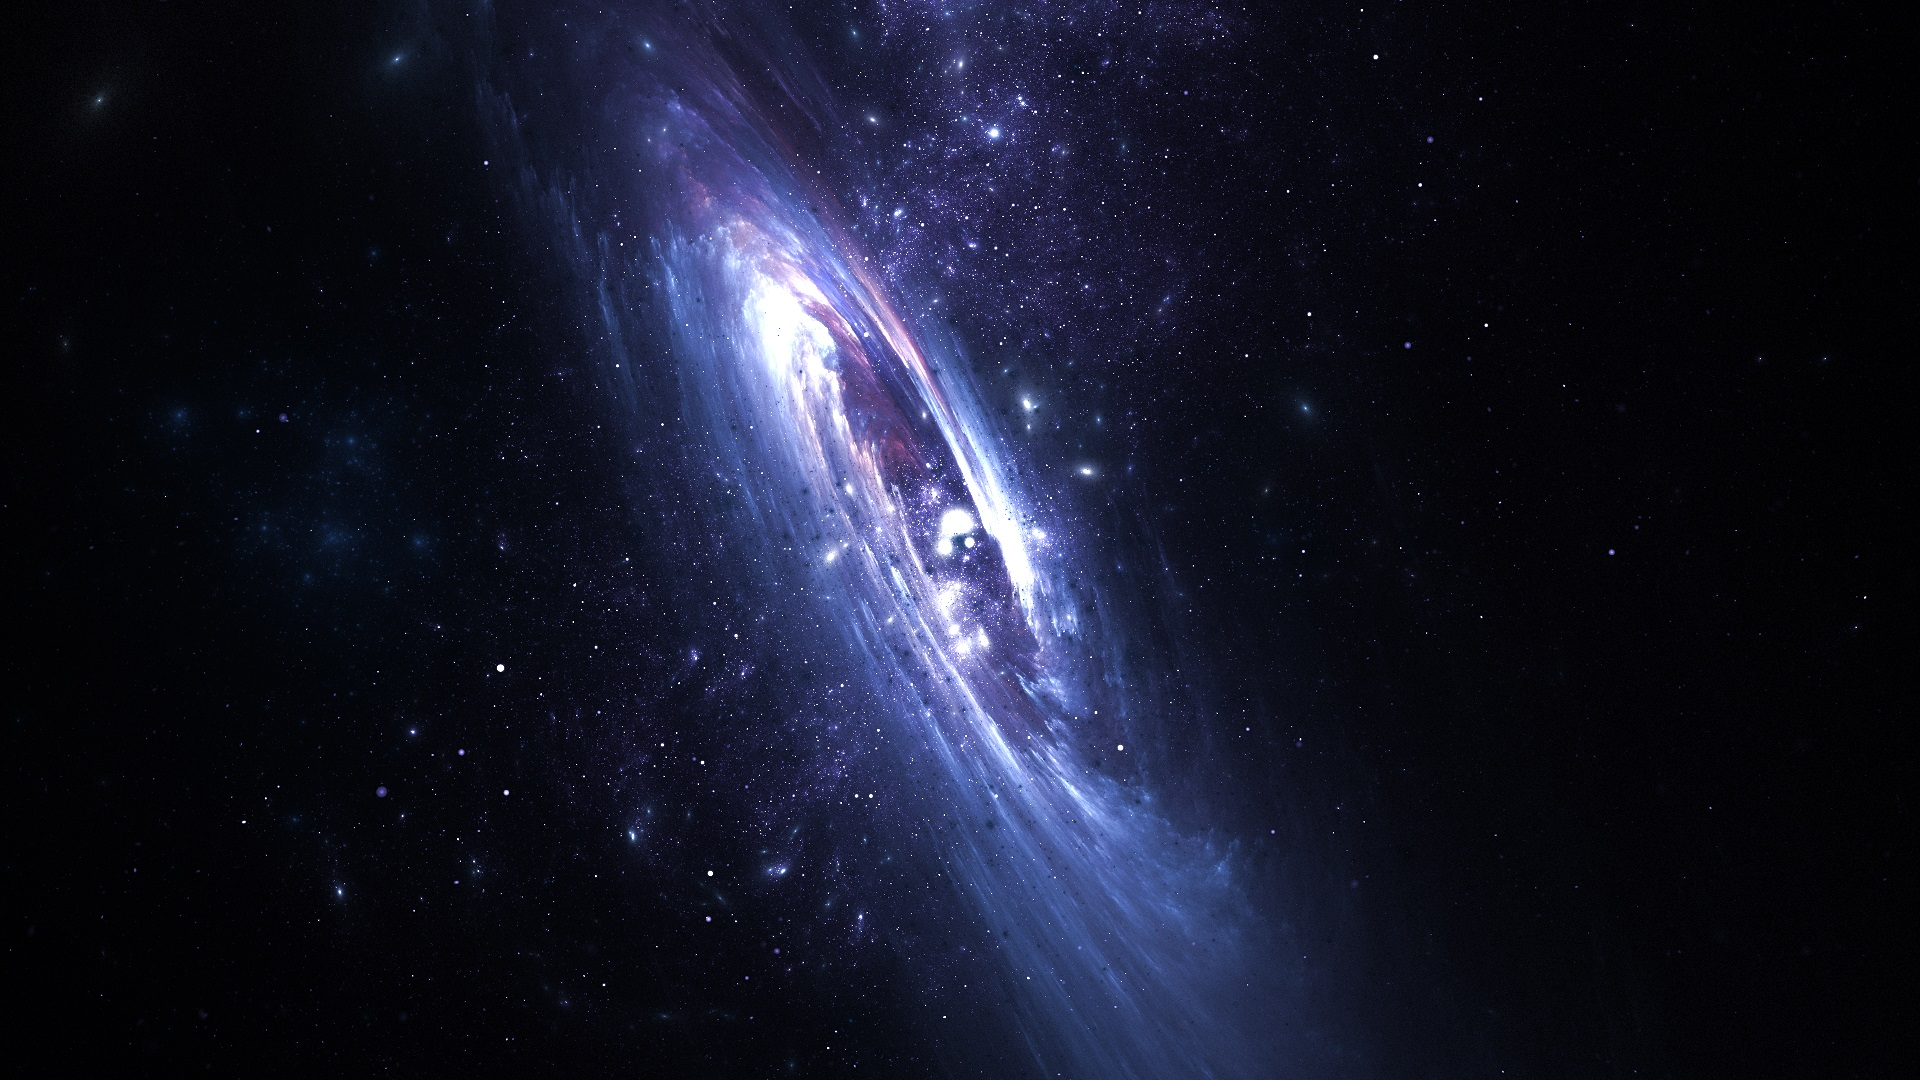 galaxy_spiral3_1920_1080.jpg